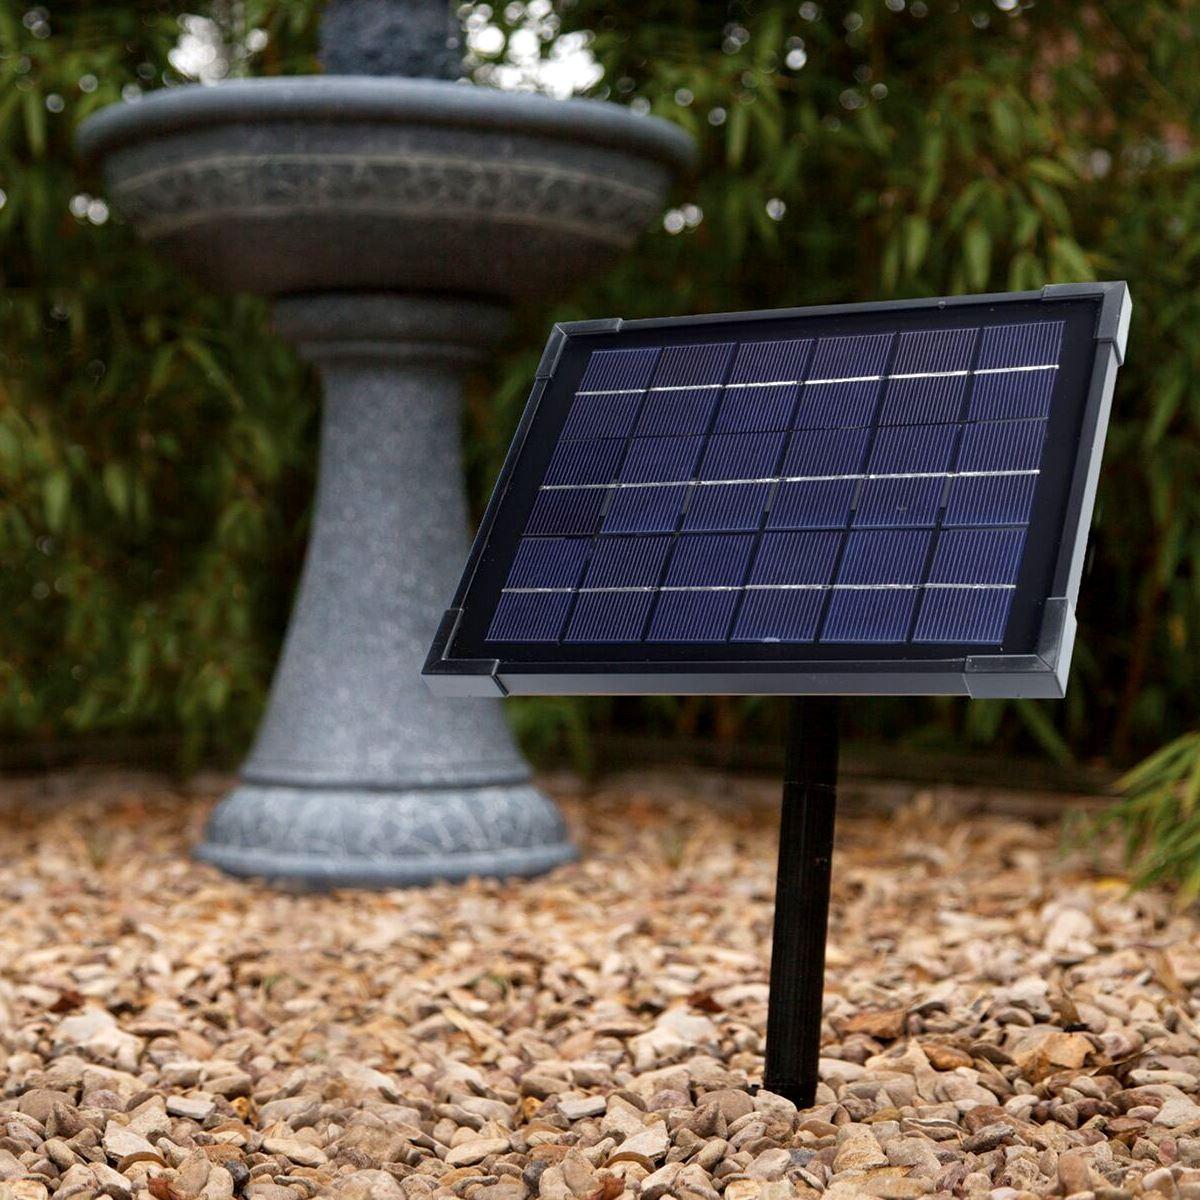 BLAGDON LIBERTY 5 WATT SOLAR PANEL FOR GARDEN OUTDOOR WATER FEATURES ACCESSORY